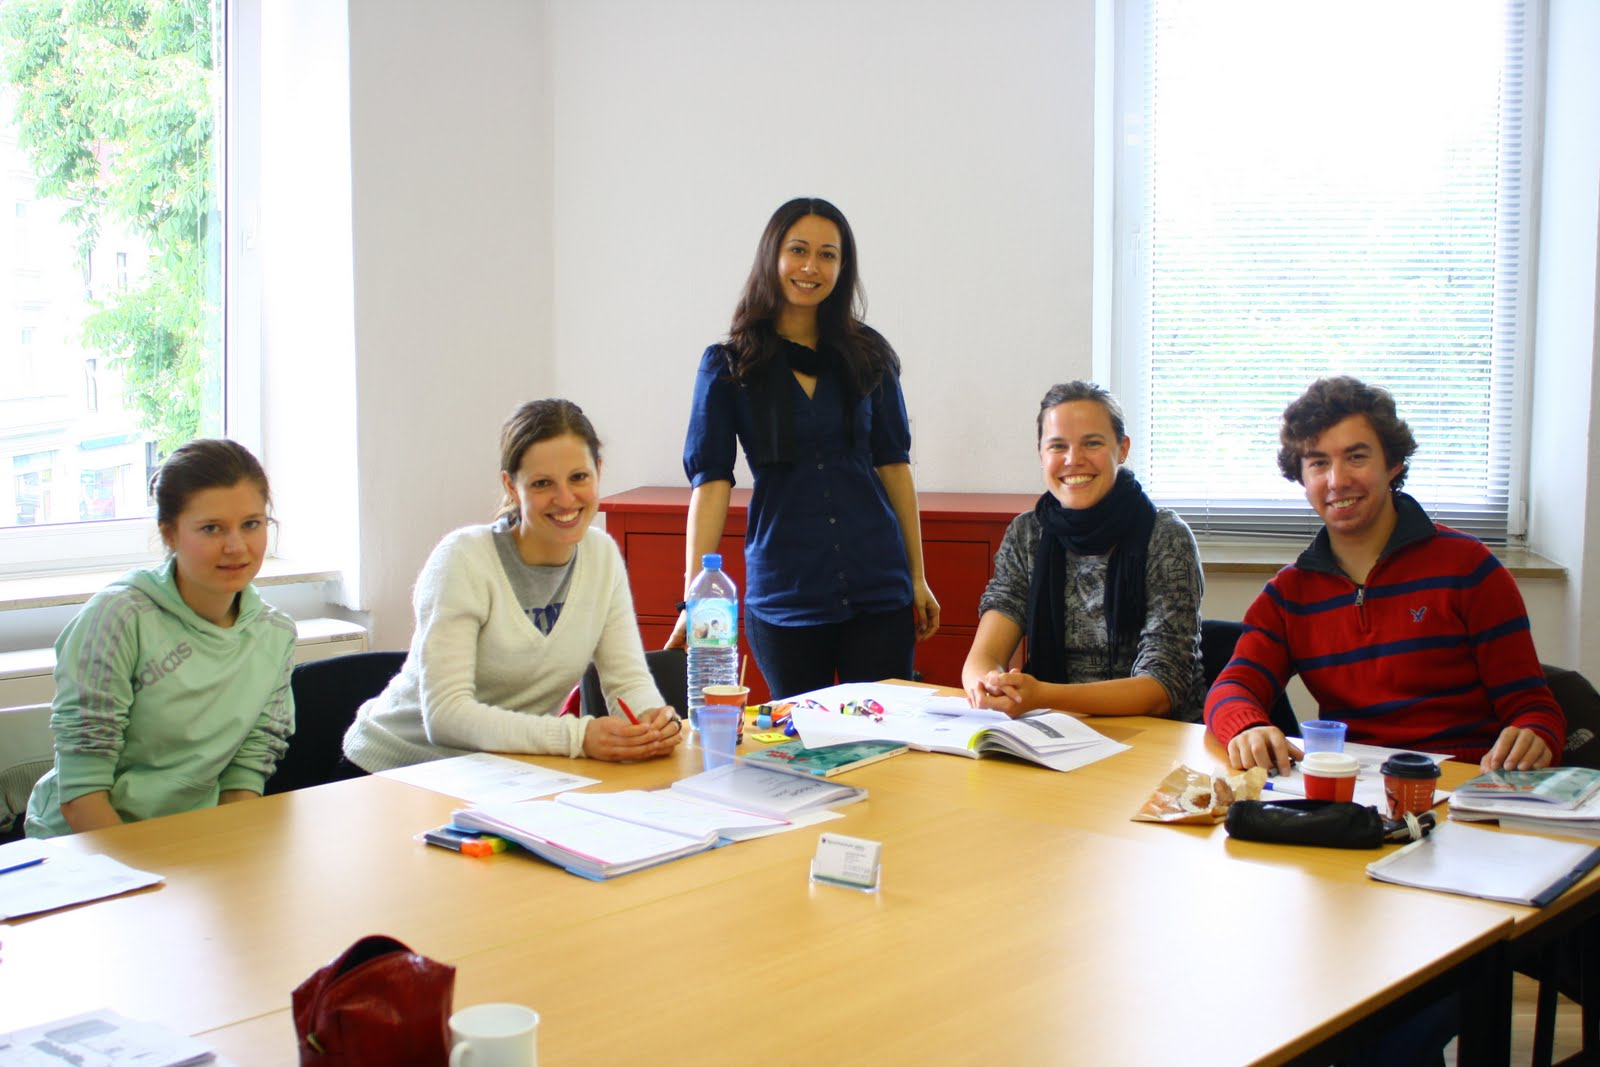 Albanisch lernen in Nürnberg - Albanisch Sprachschule